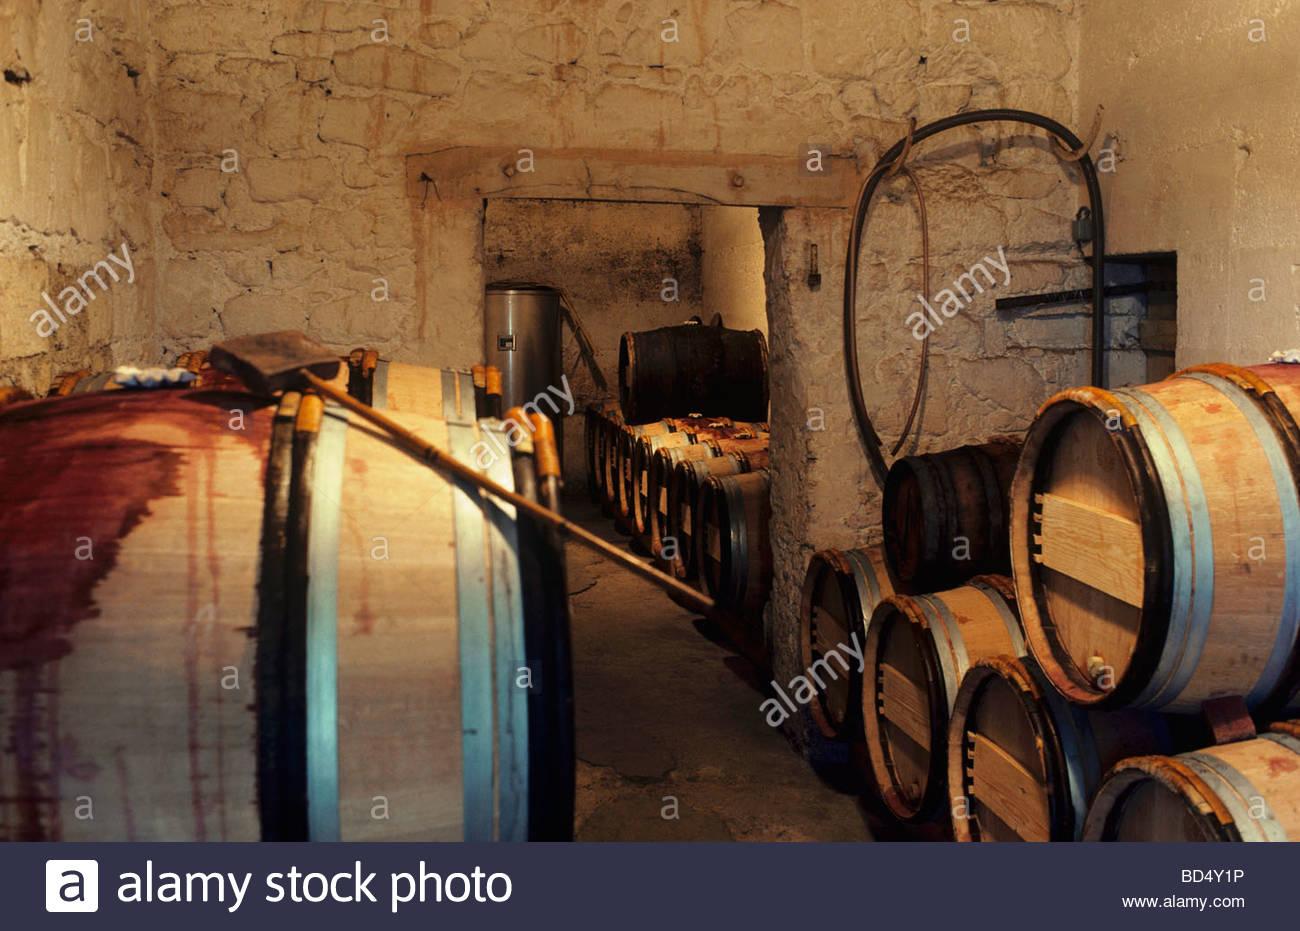 Wine cellar of Château le Pin Pomerol Bordeaux France - Stock Image & Wine Cellar Château Le Pin Stock Photos u0026 Wine Cellar Château Le Pin ...